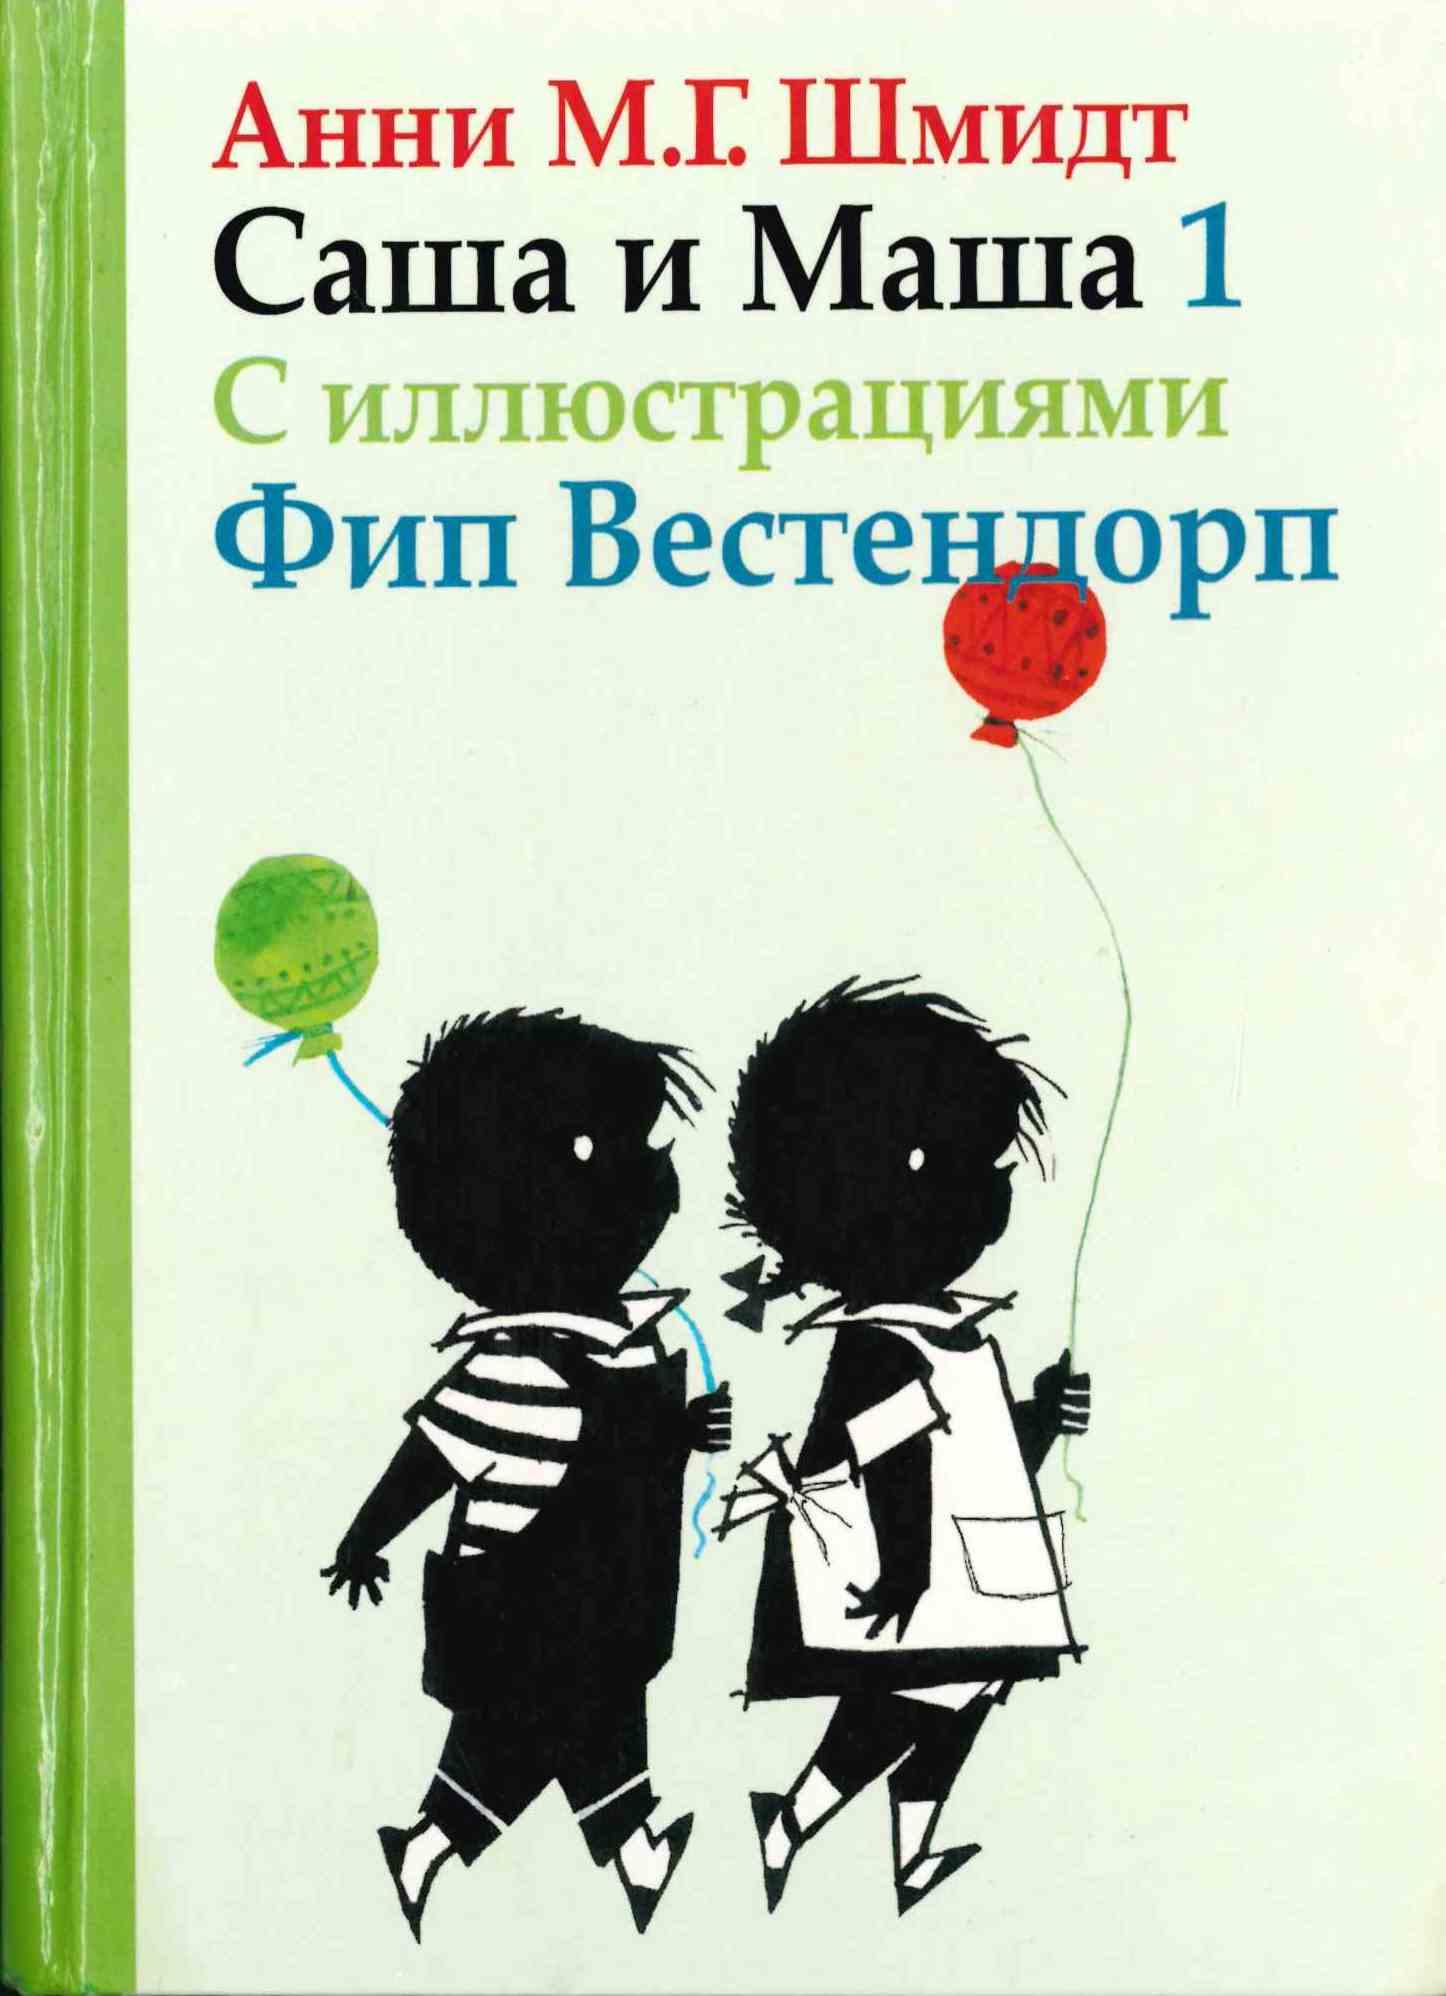 Книги про Сашу иМашу